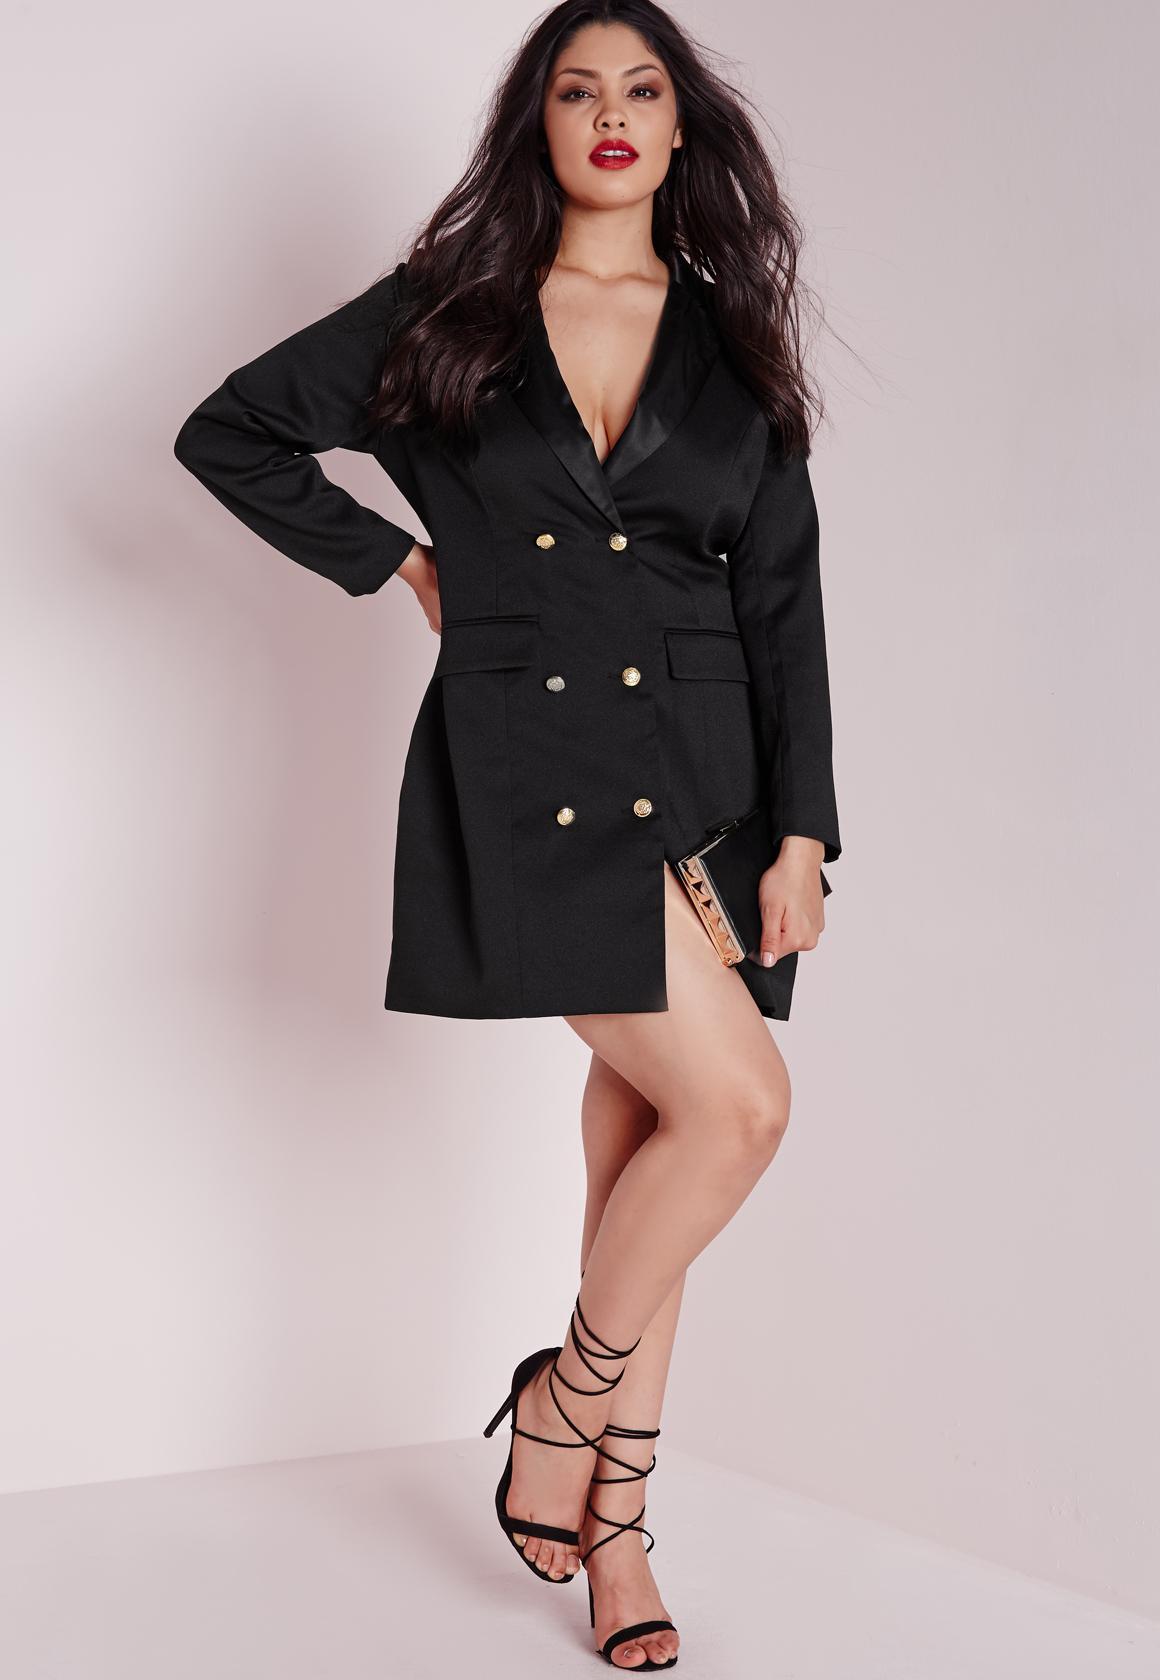 Plus Size Collar Dress